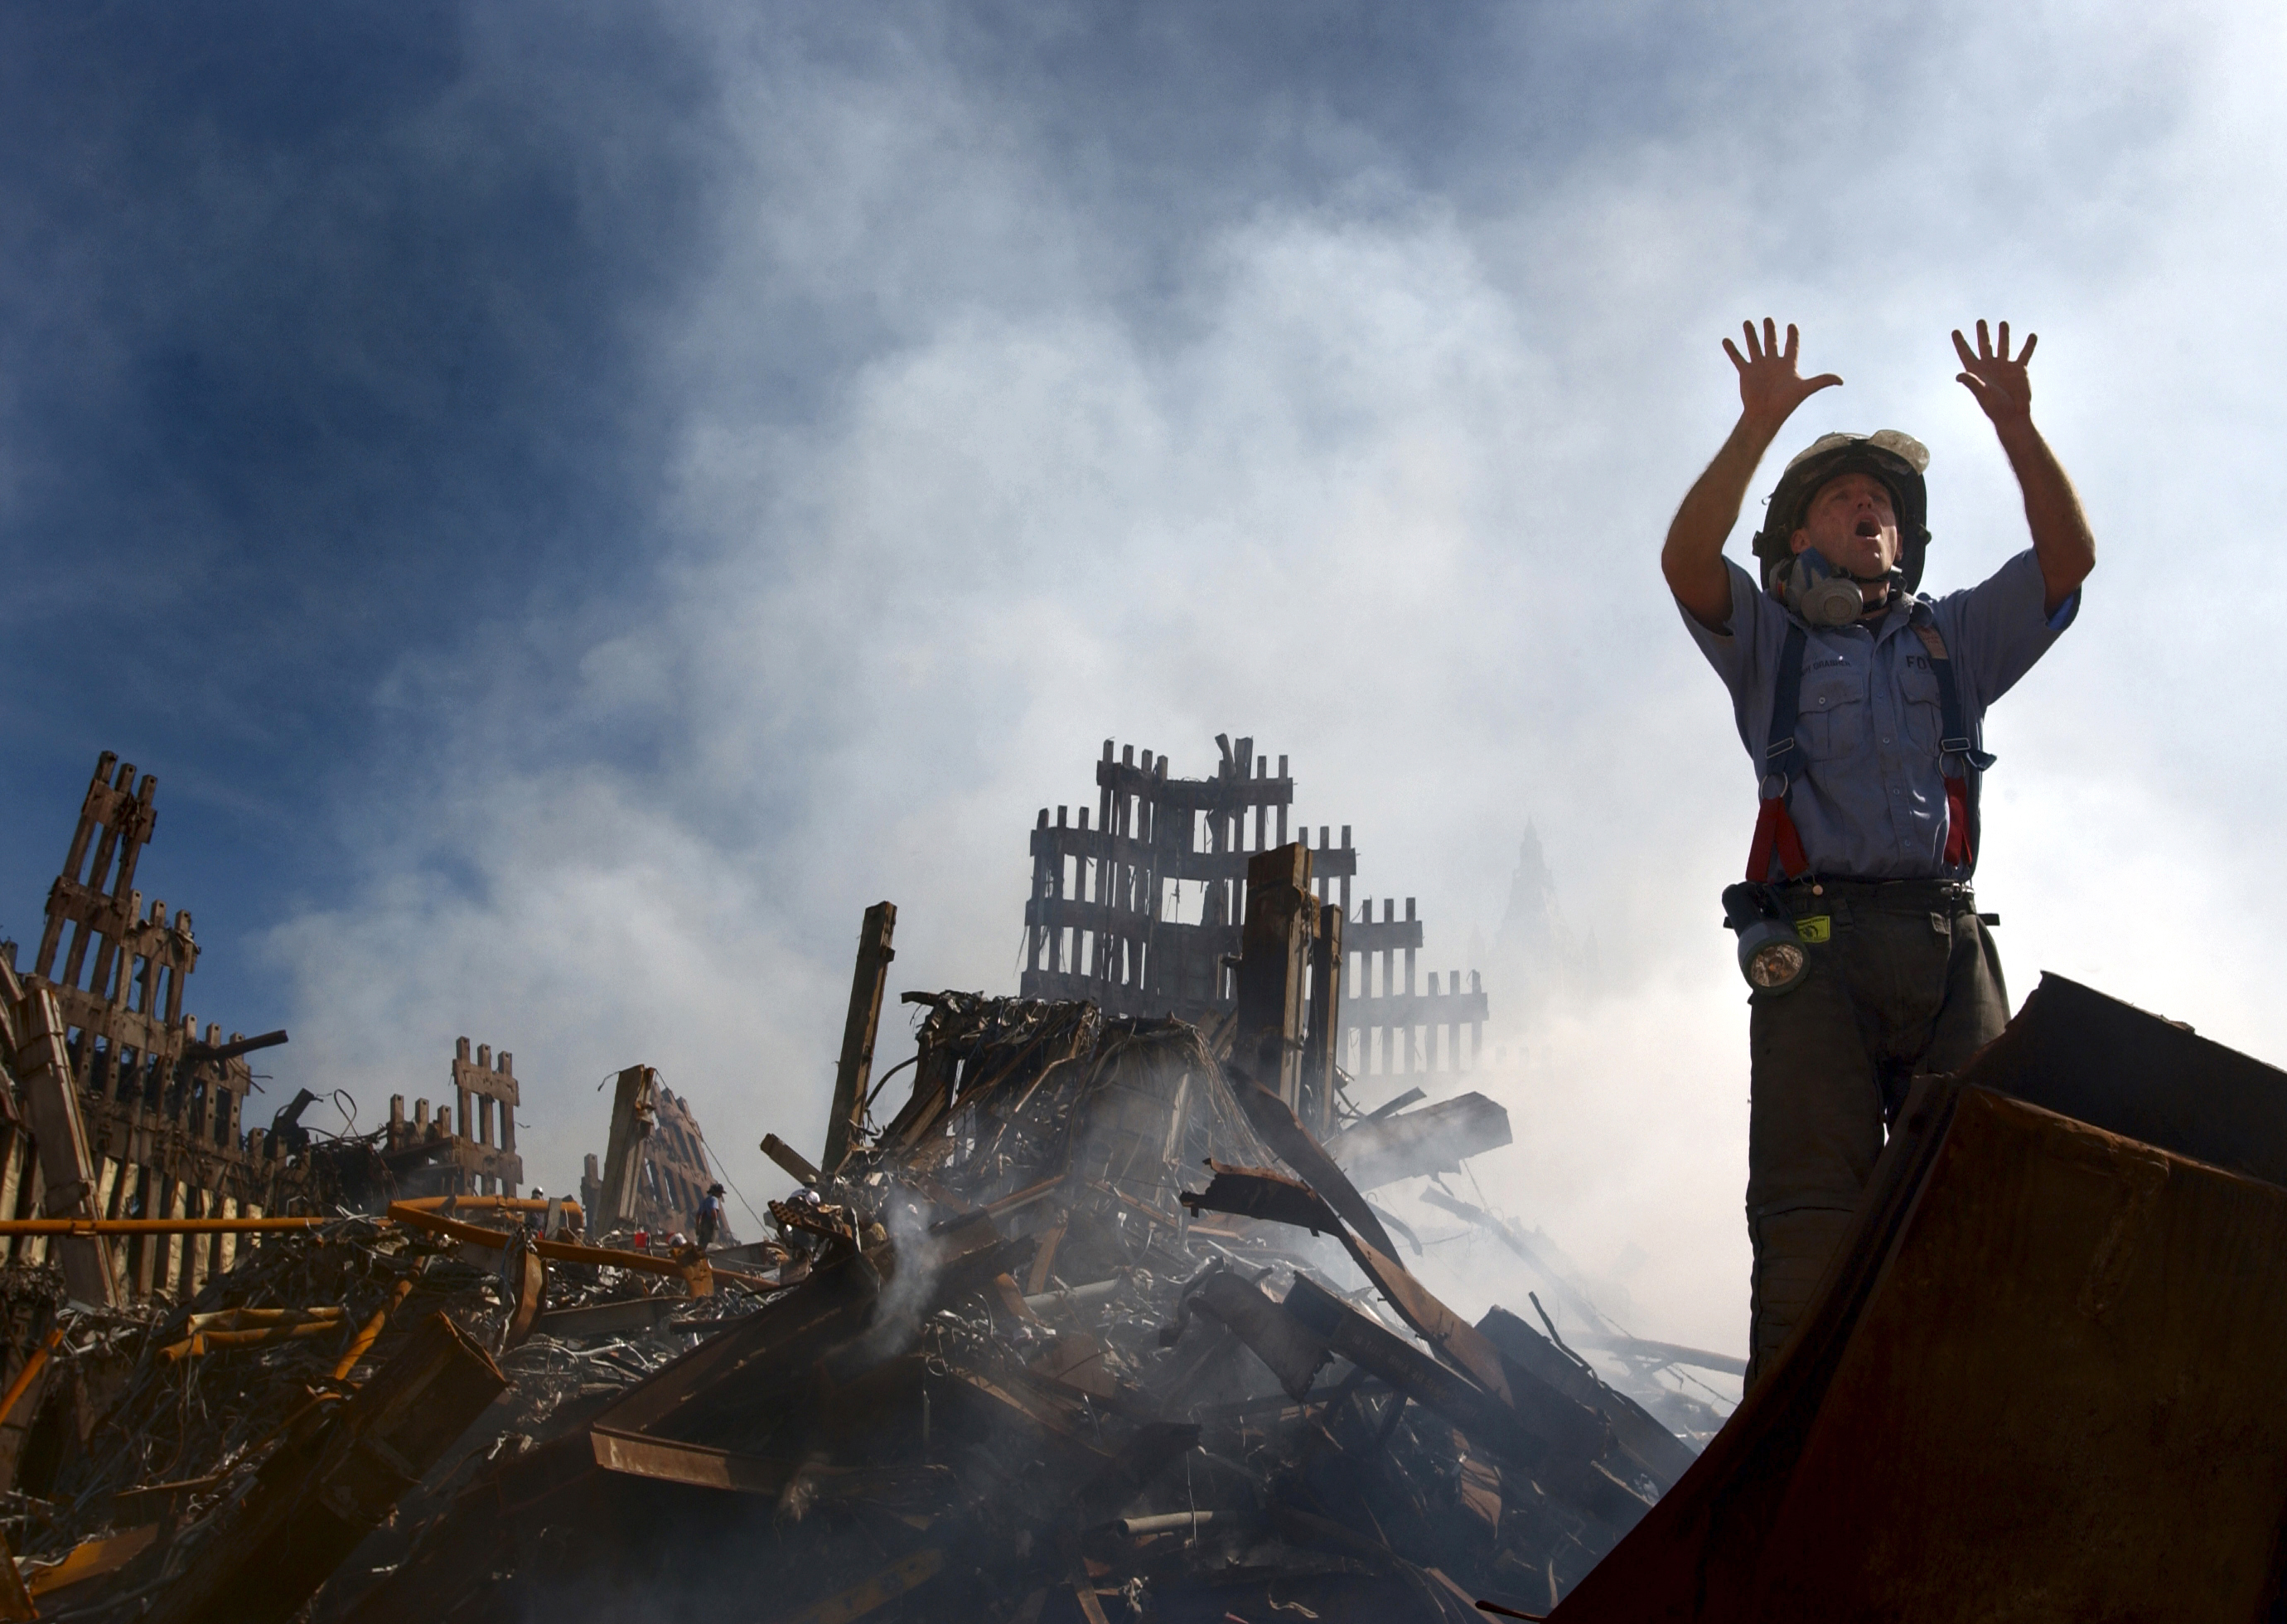 CIVIL ENGINEERING RESEARCHERS DISPROVE OFFICIAL EXPLANATION OF WTC 7'S DESTRUCTION